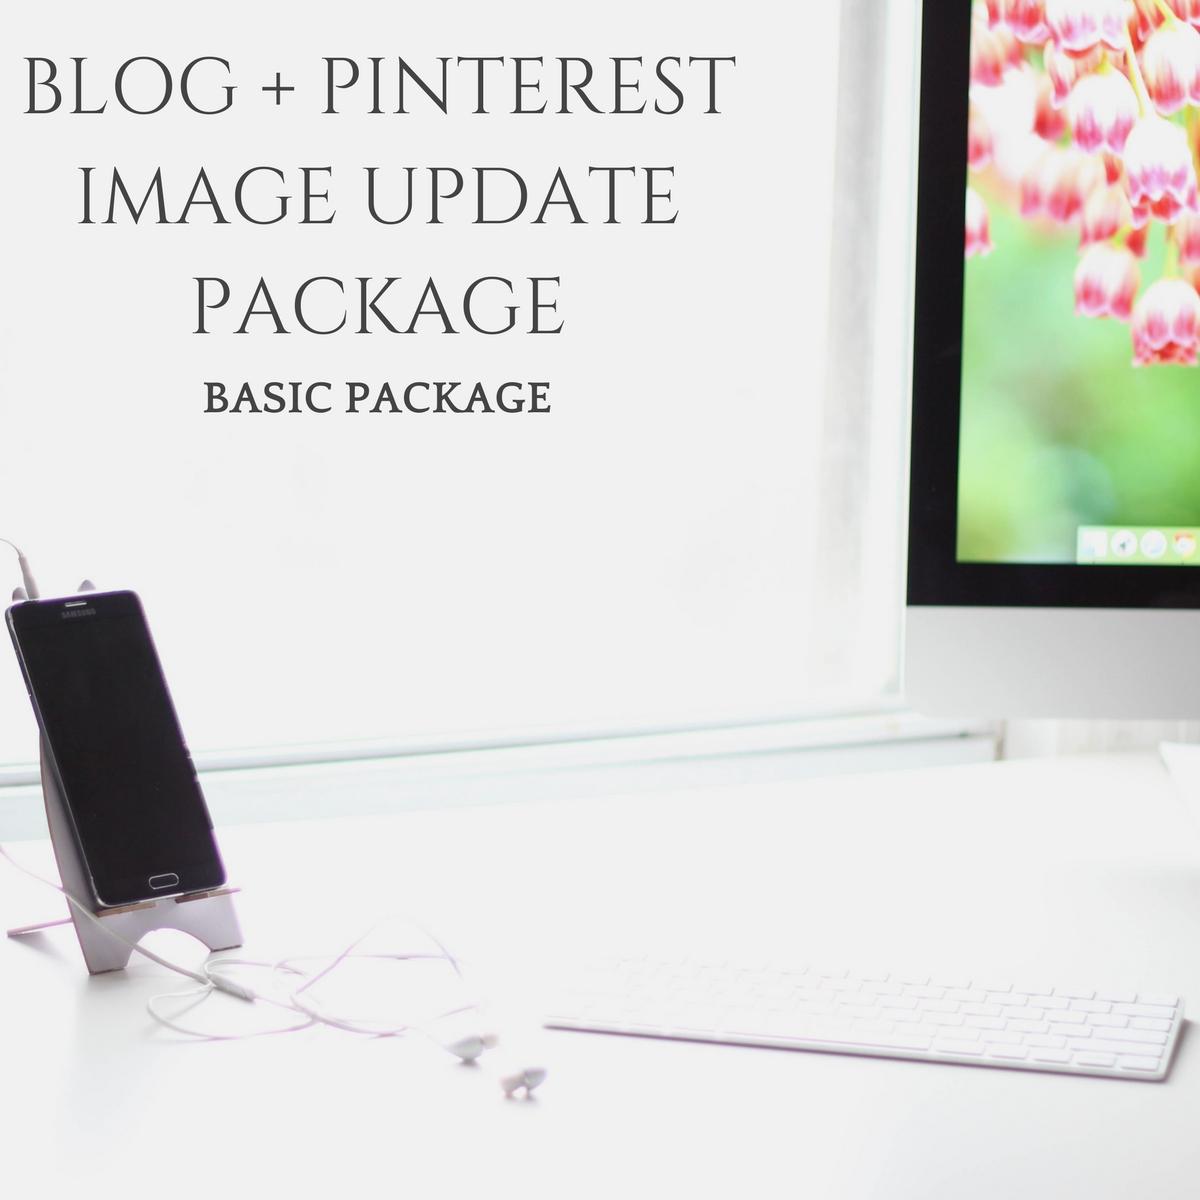 BLOG + PINTEREST IMAGE UPDATES - BASIC PACKAGE